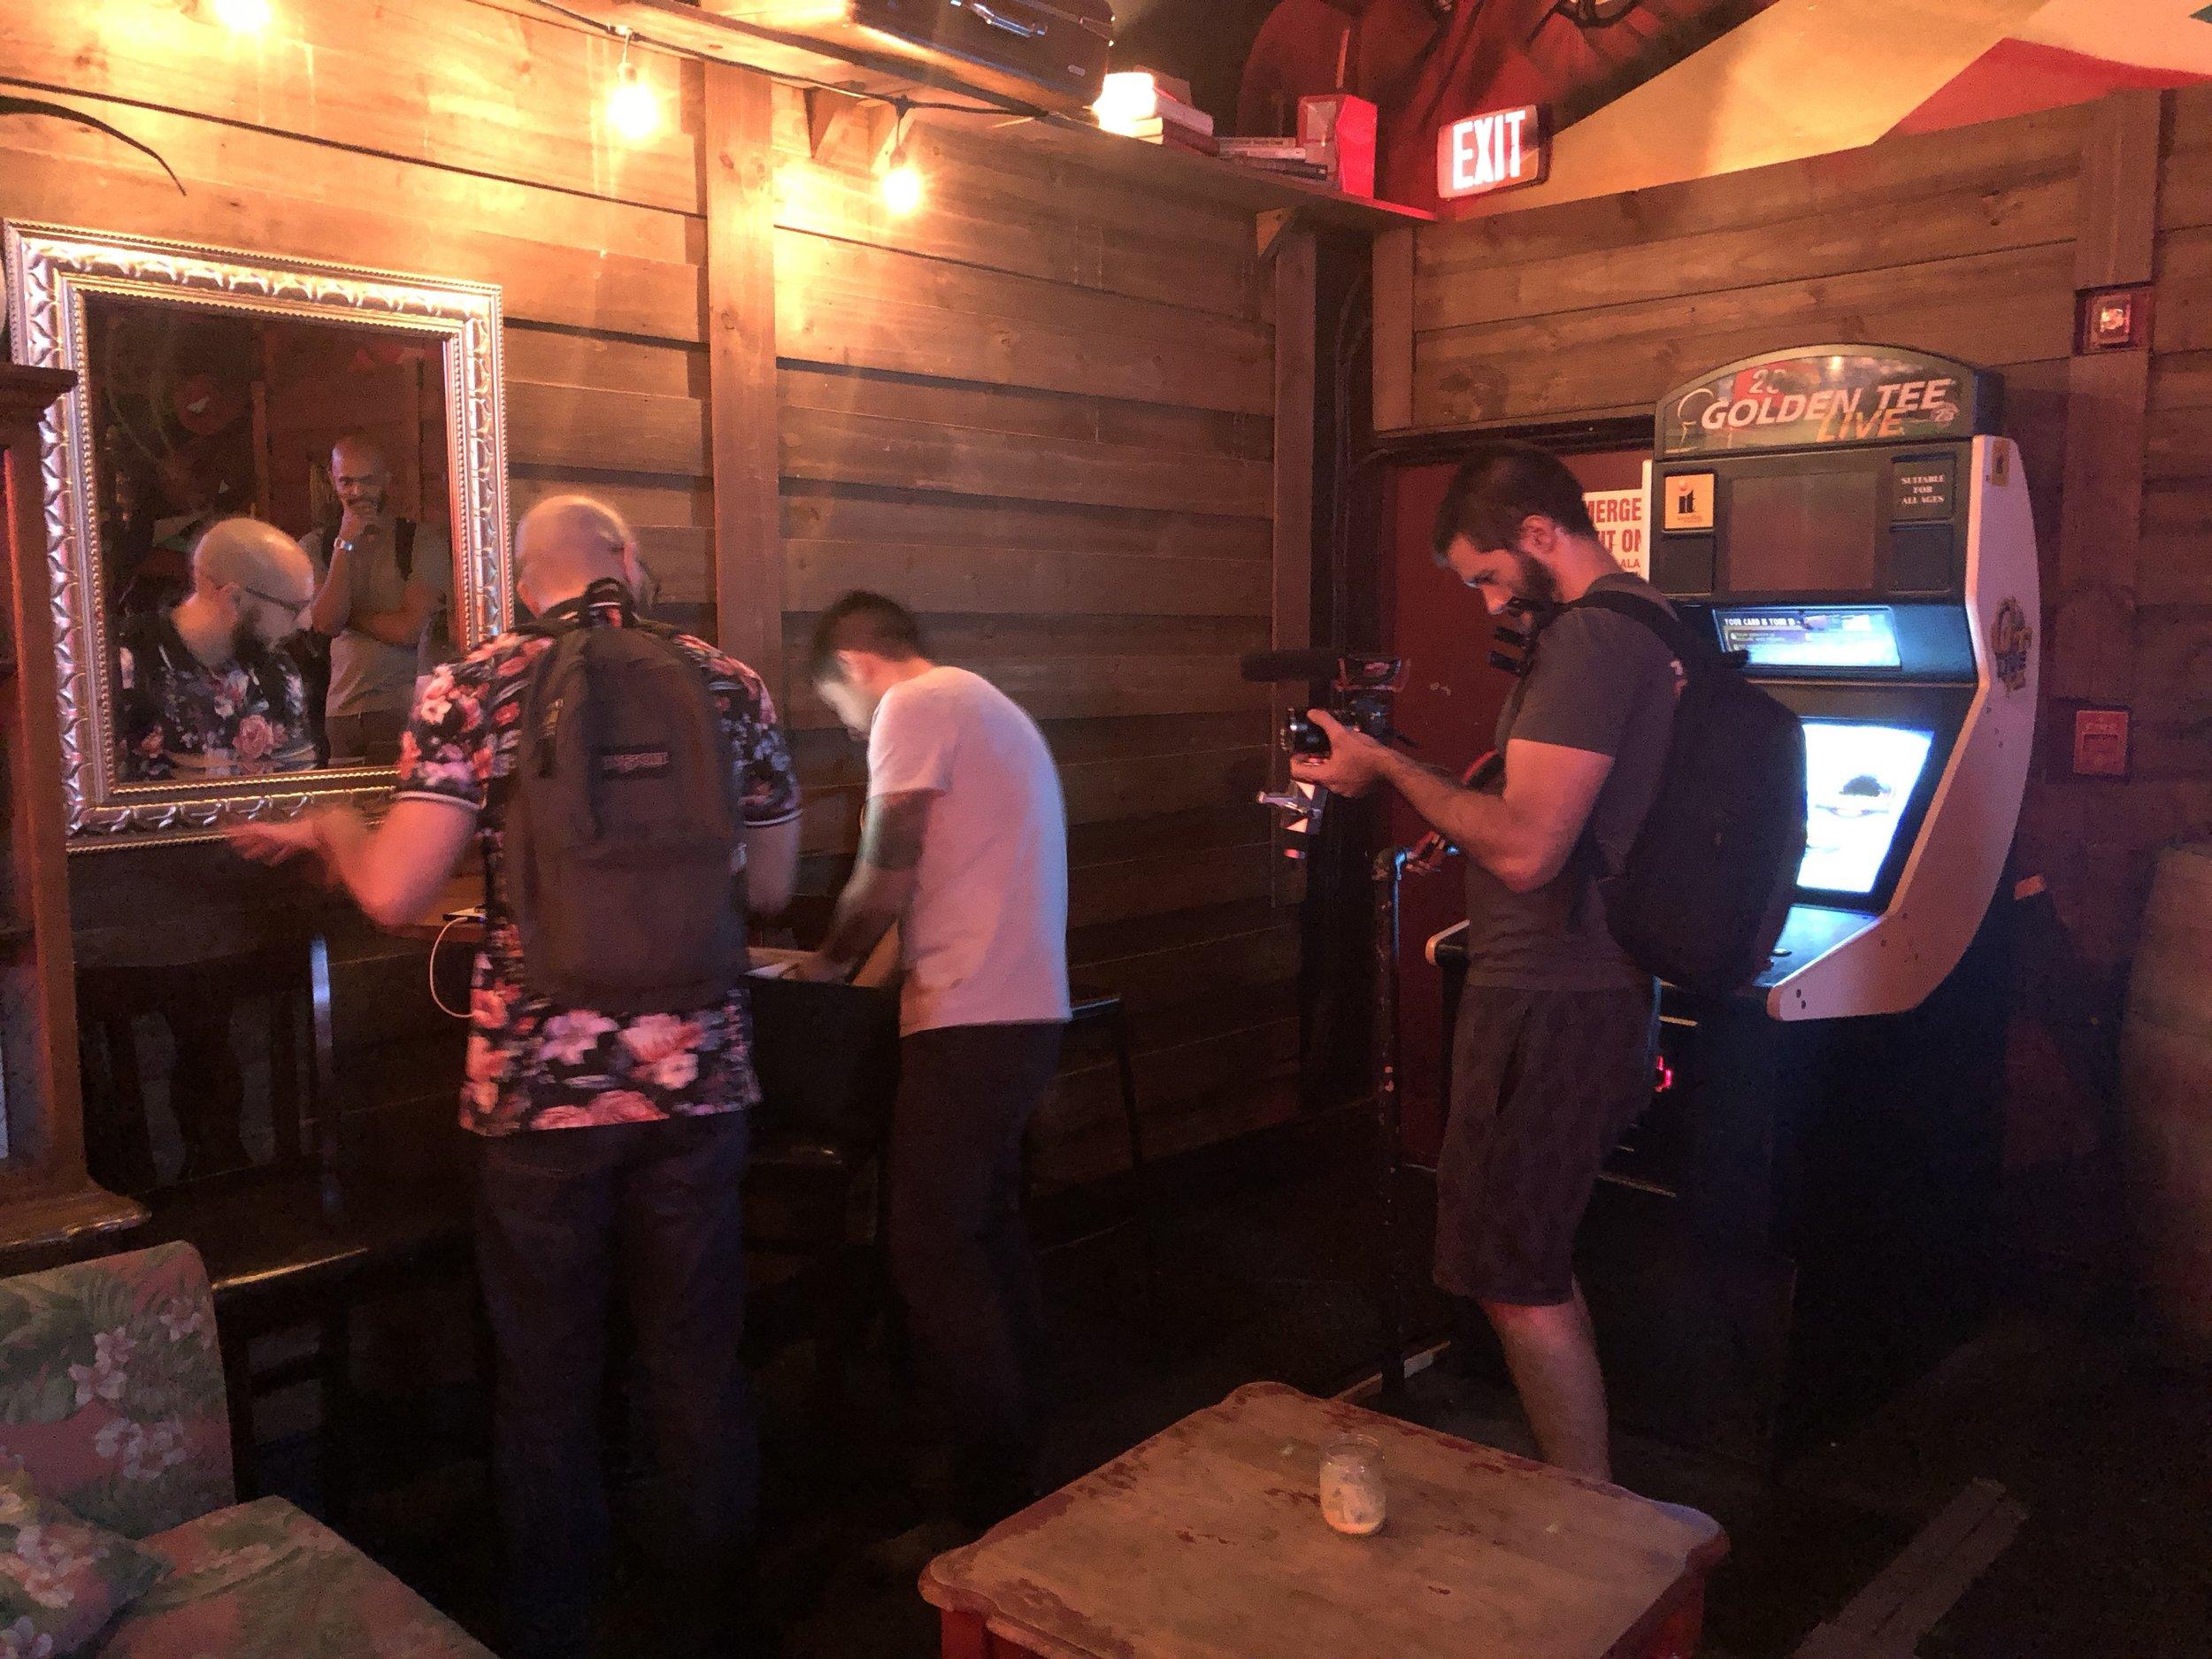 Behind the scenes: Sebastian Mattar and Manny Garavito chatting and preparing for a Miami Comedy  show at Redbar in Brickell.